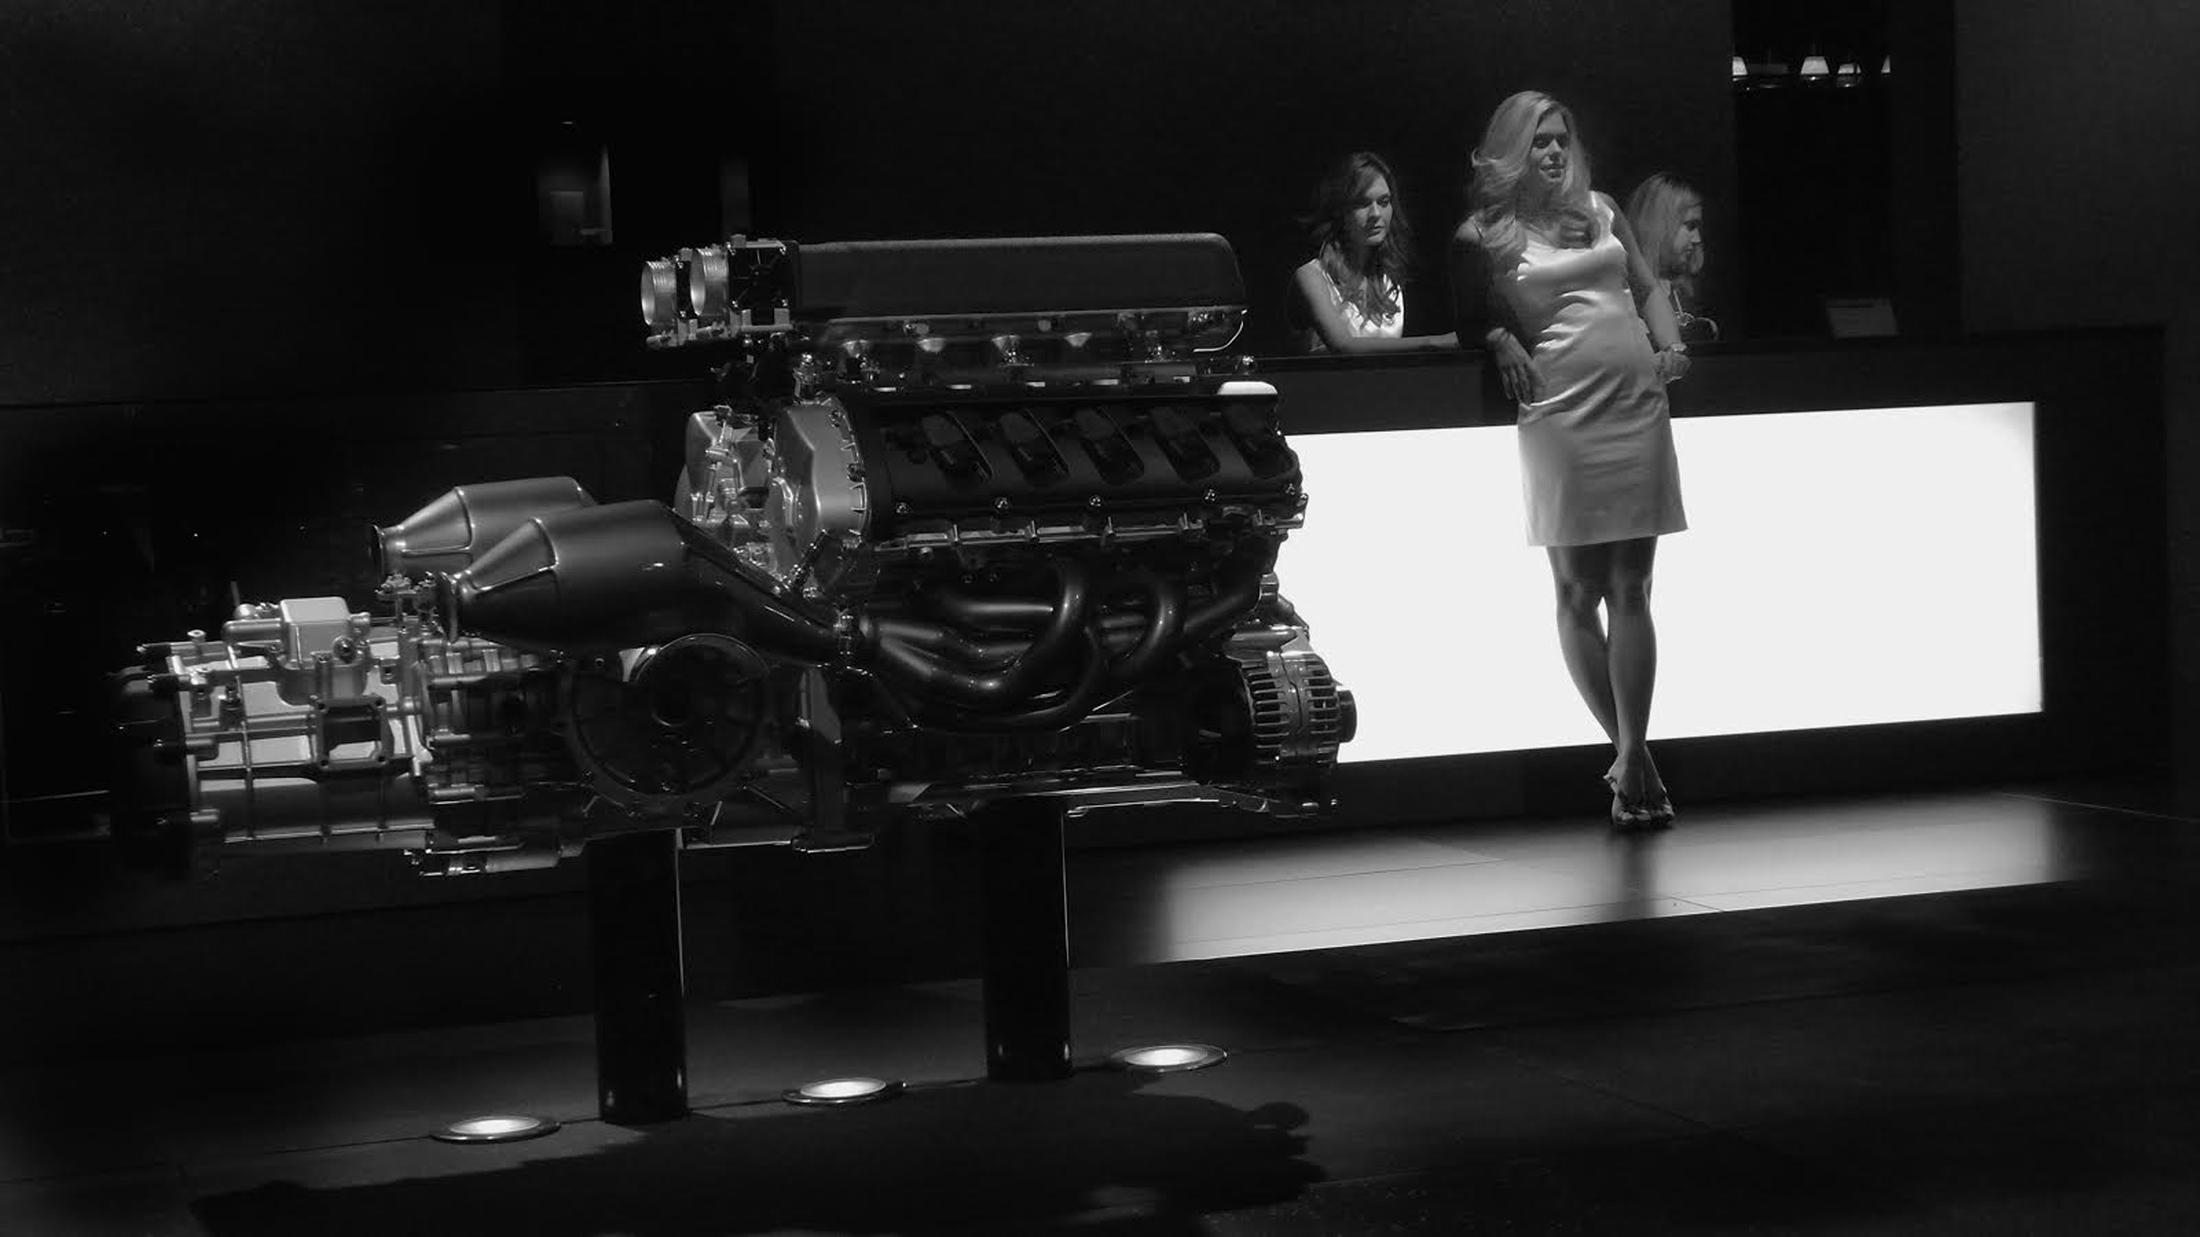 Girls and Motors